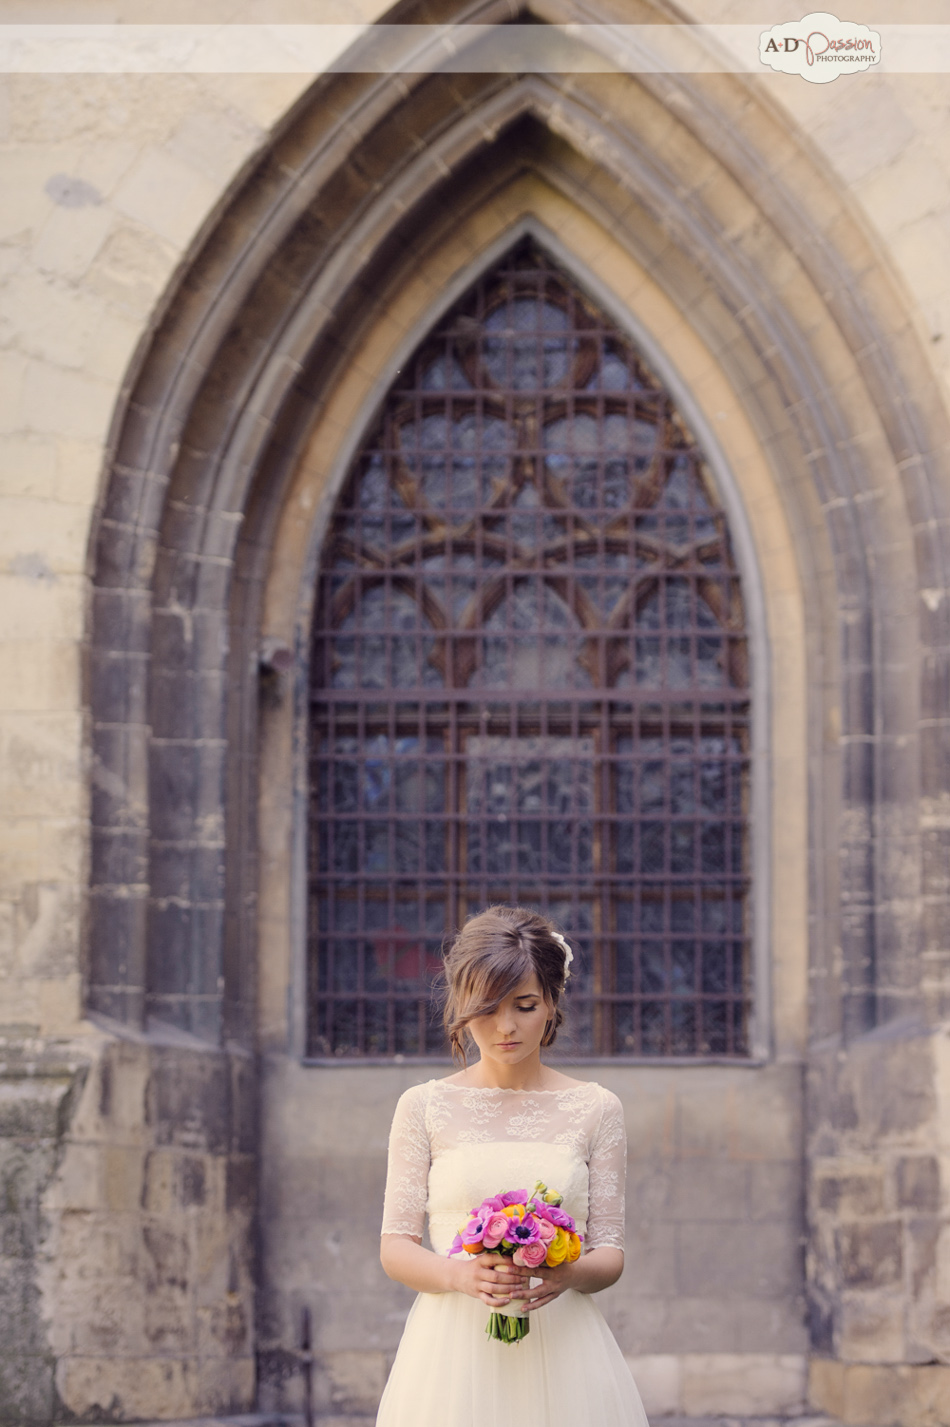 AD Passion Photography | 20130529_fotograf-nunta_elisa_si_marius_0051 | Adelin, Dida, fotograf profesionist, fotograf de nunta, fotografie de nunta, fotograf Timisoara, fotograf Craiova, fotograf Bucuresti, fotograf Arad, nunta Timisoara, nunta Arad, nunta Bucuresti, nunta Craiova